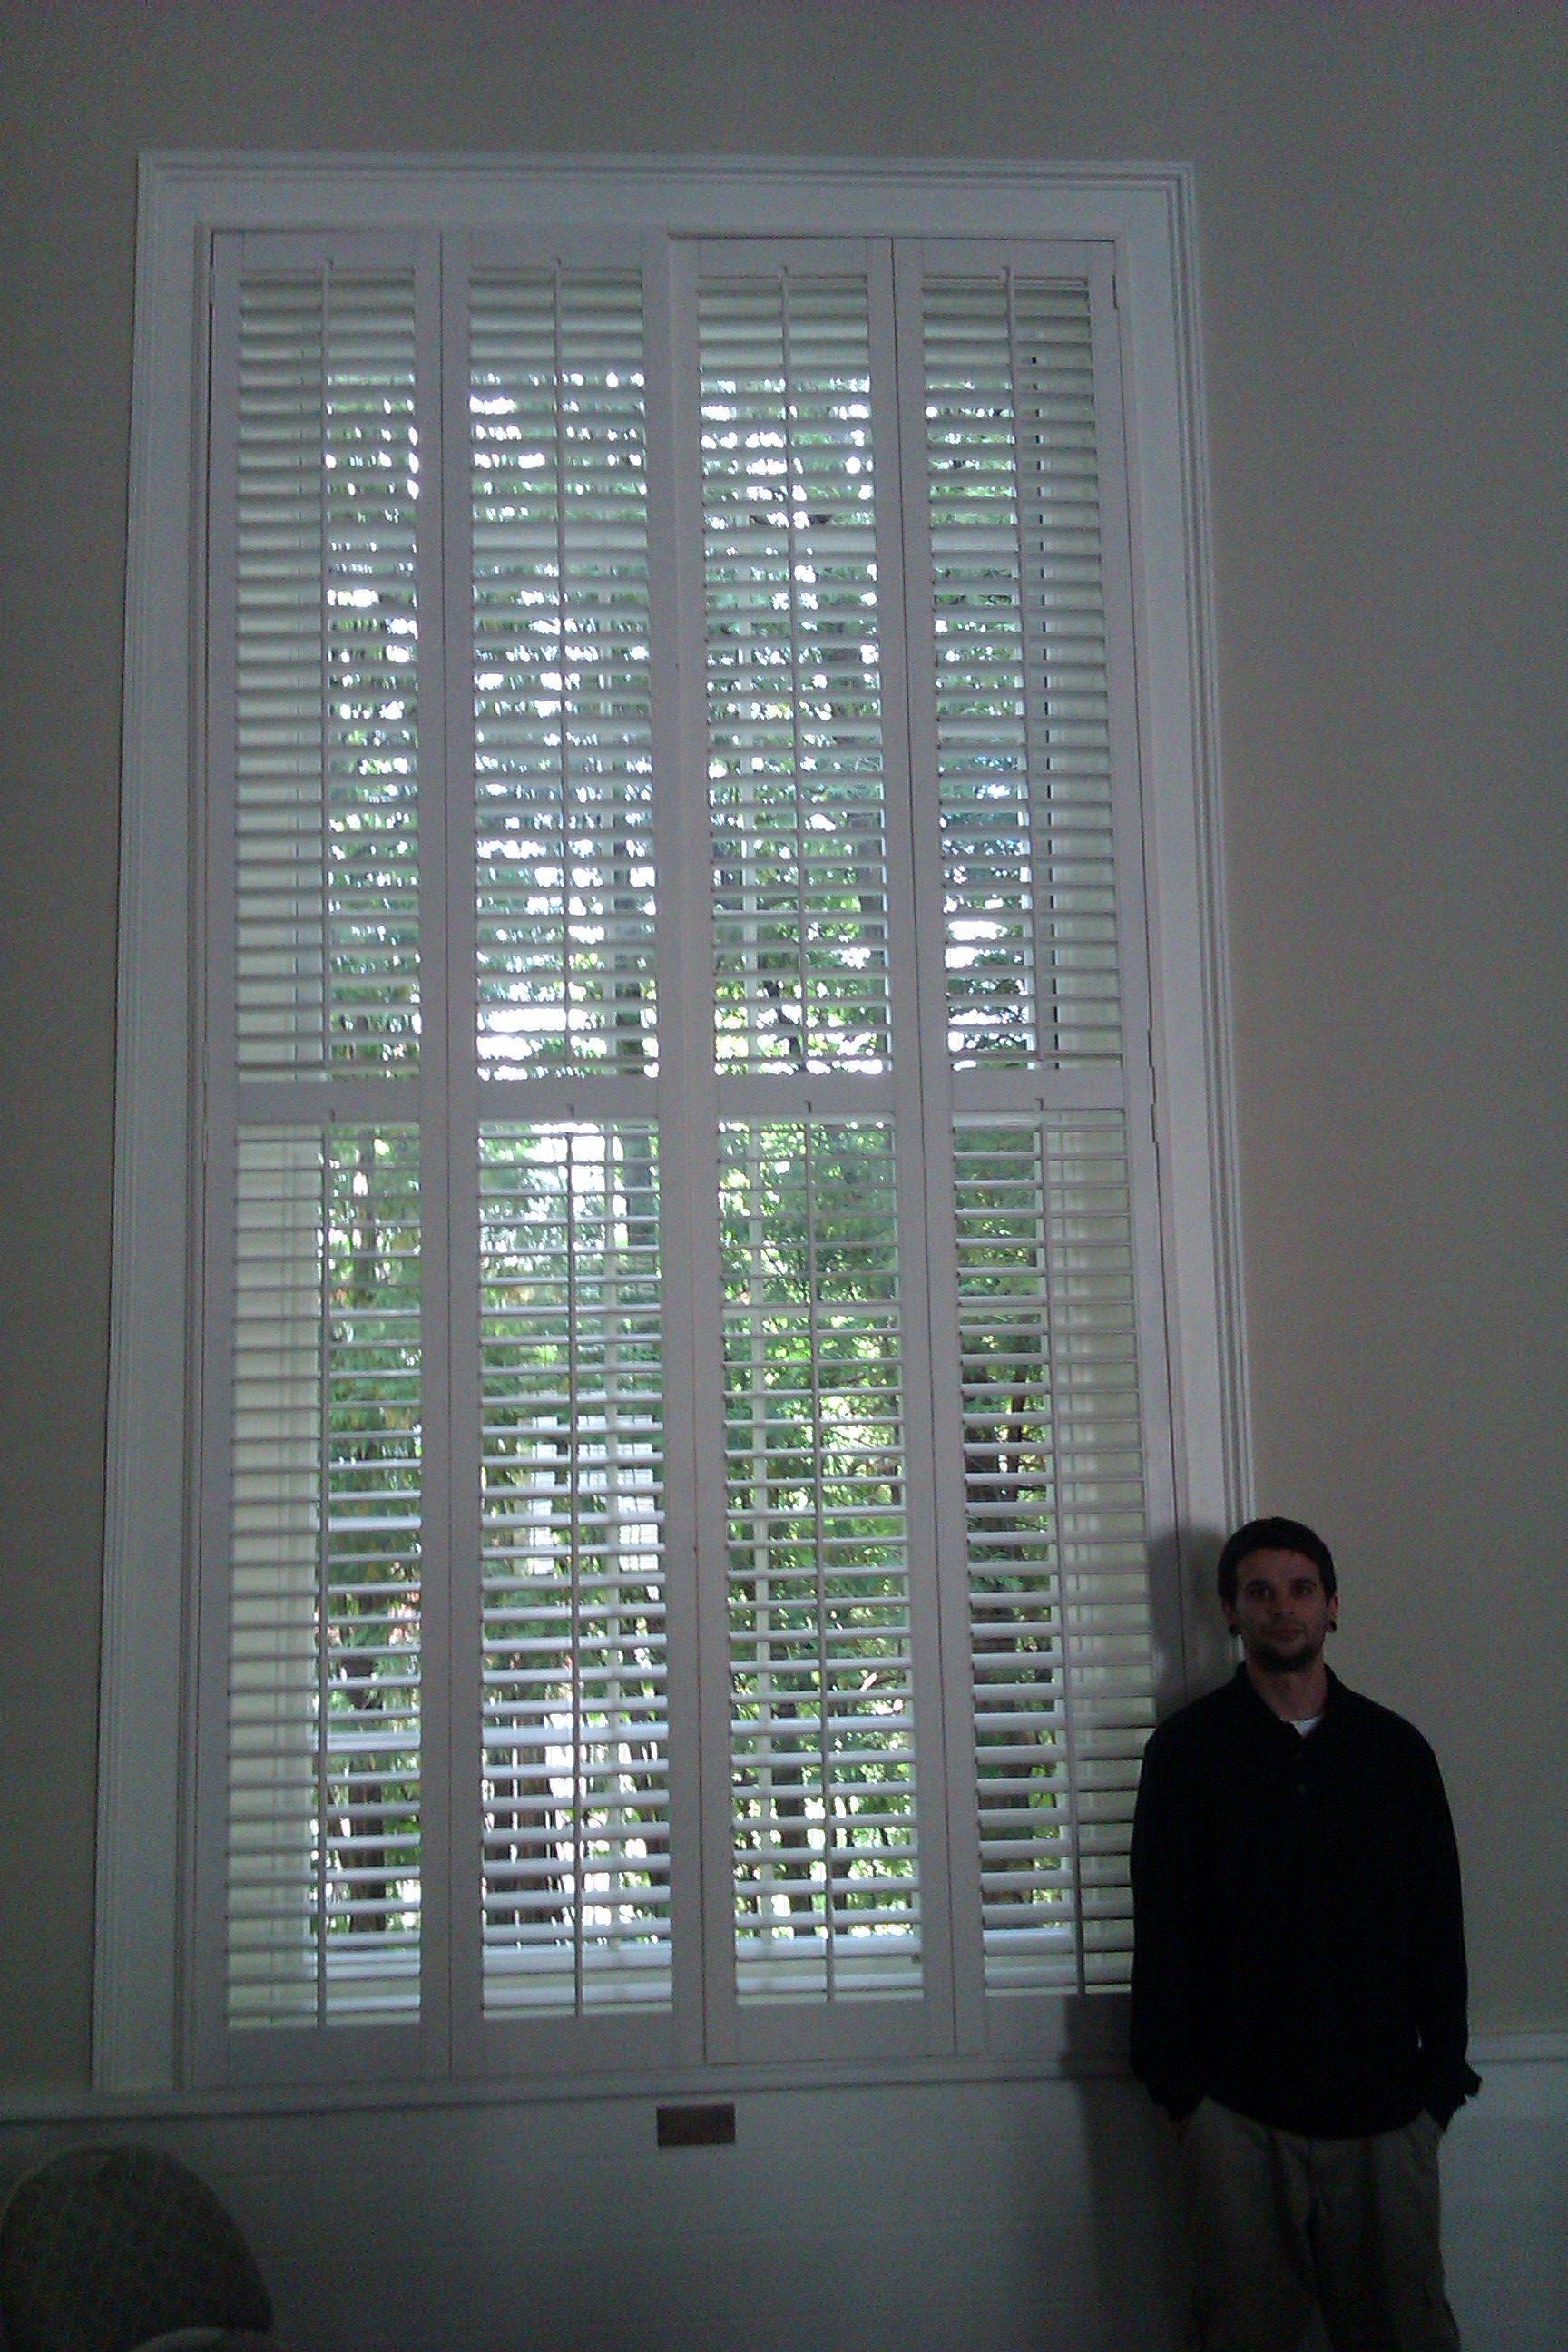 Worlds largest plantation shutters?